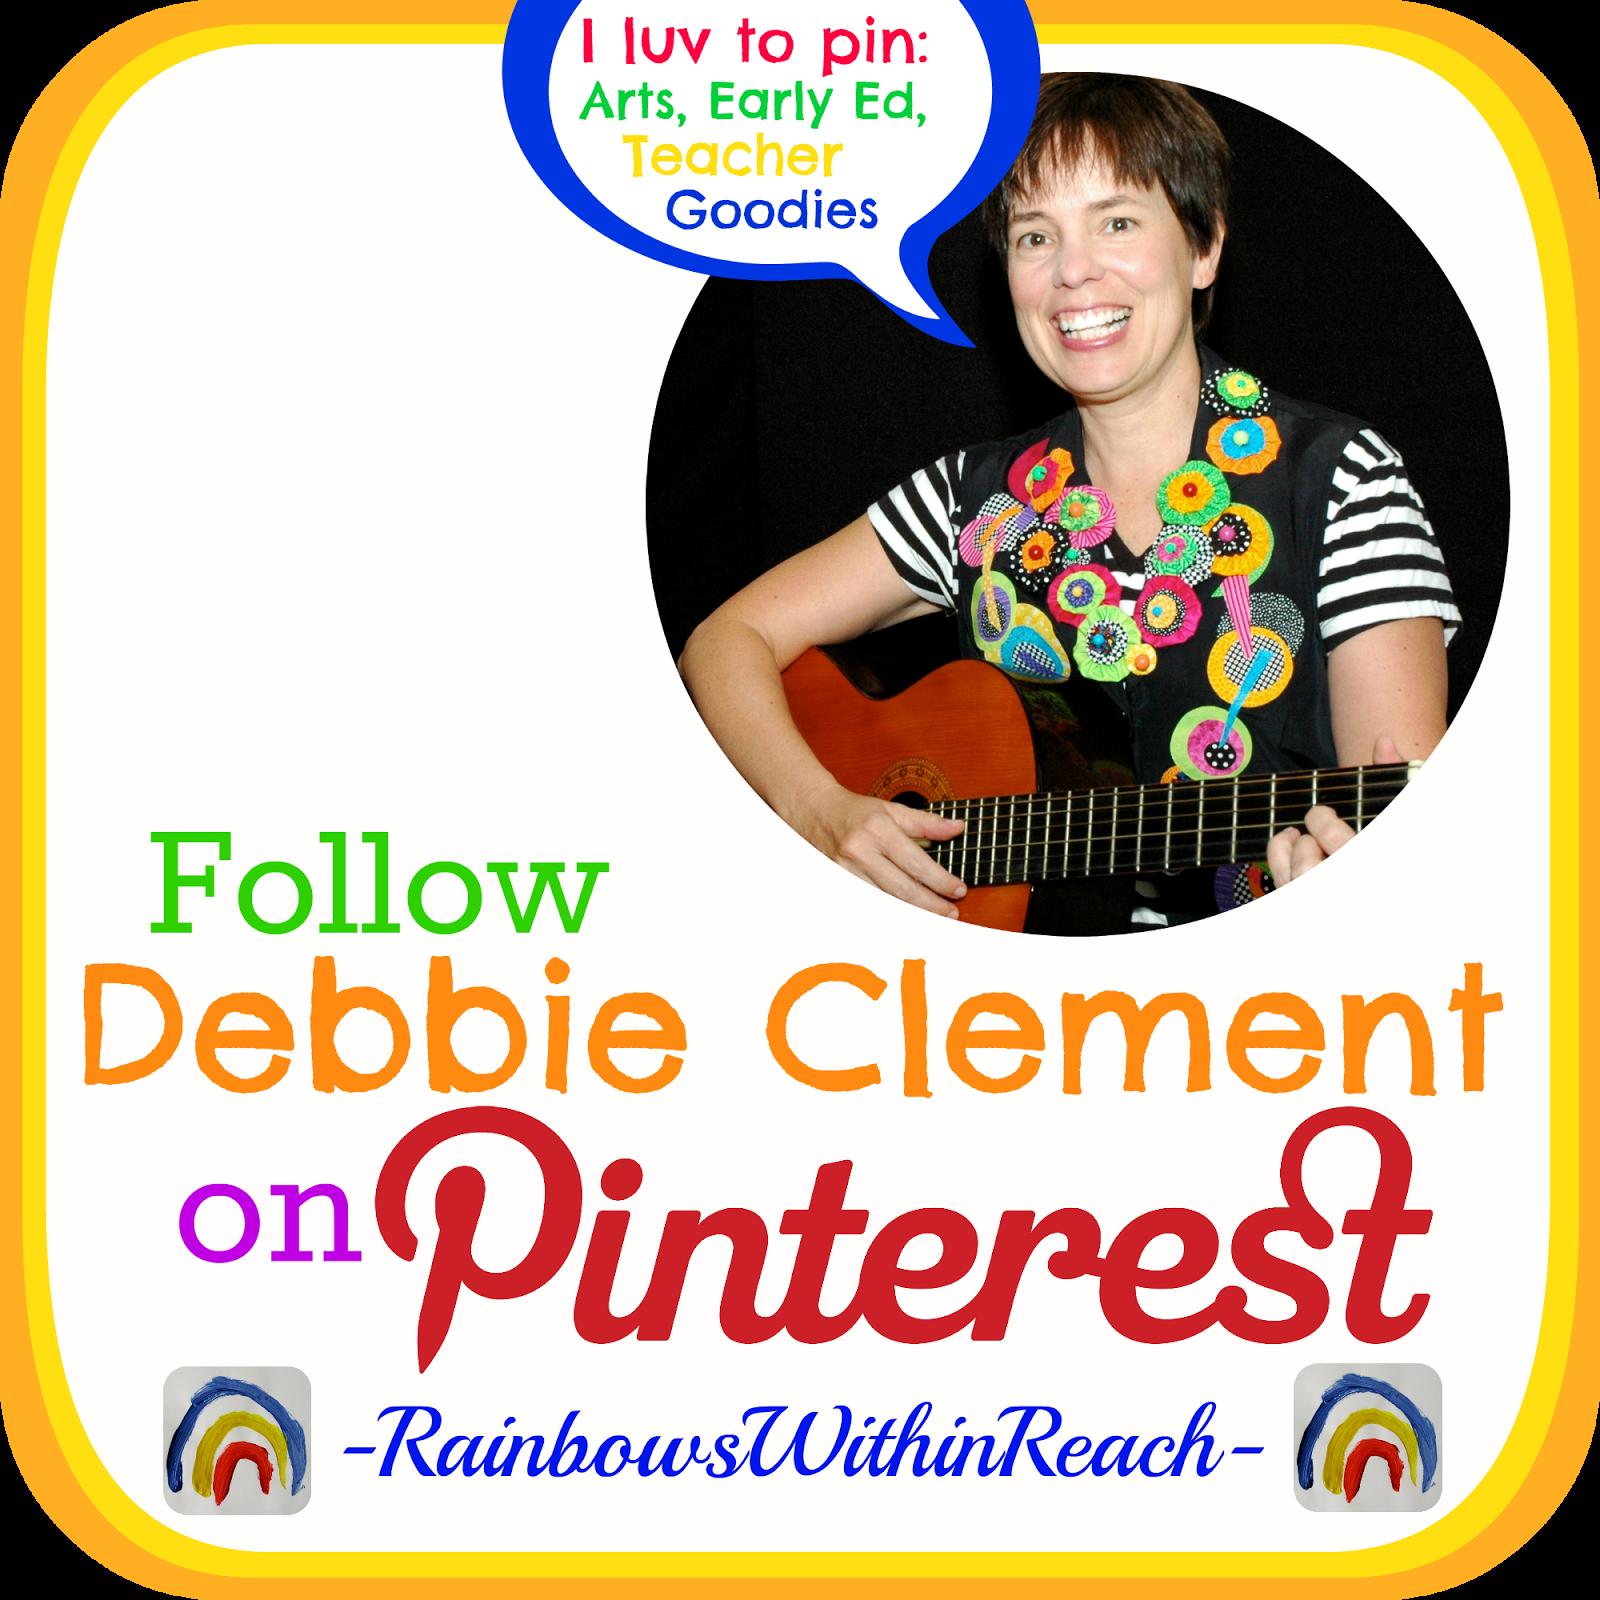 Follow Debbie Clement on Pinterest!